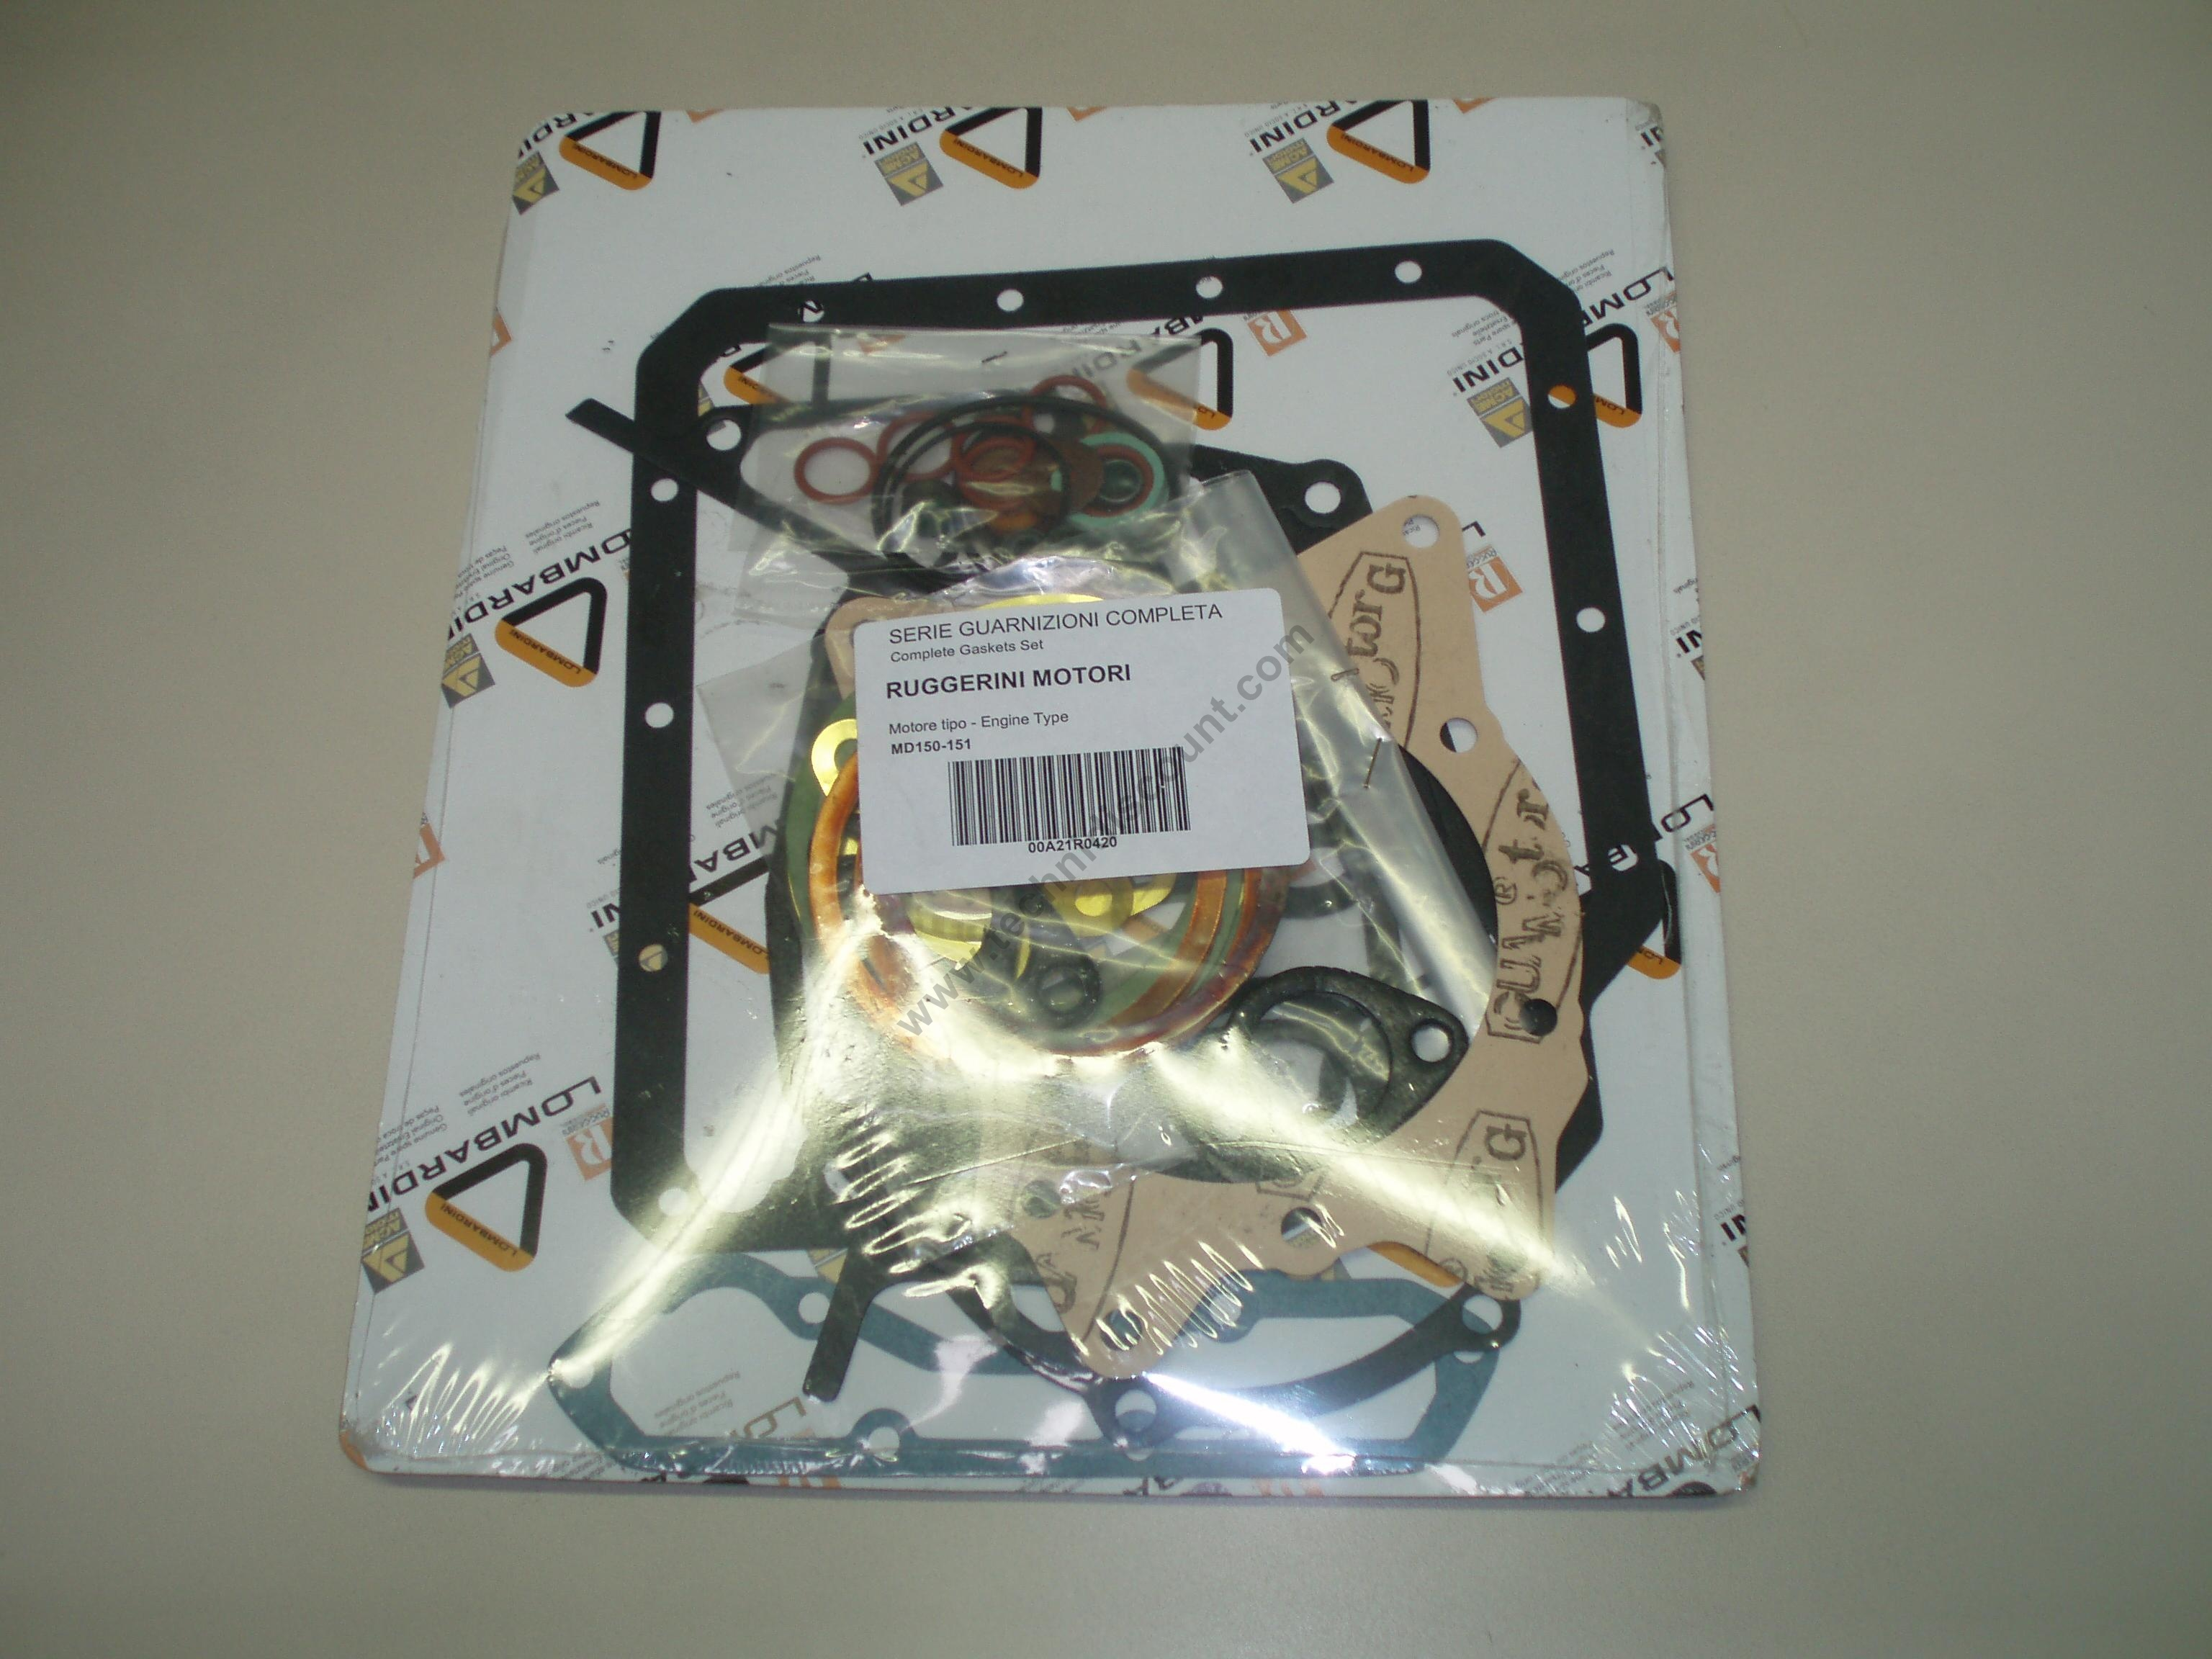 Pochette joints MD150 MD151 25LD330/2 RUGGERINI LOMBARDINI A21R042 ED00A21R0420-S FG4756100000